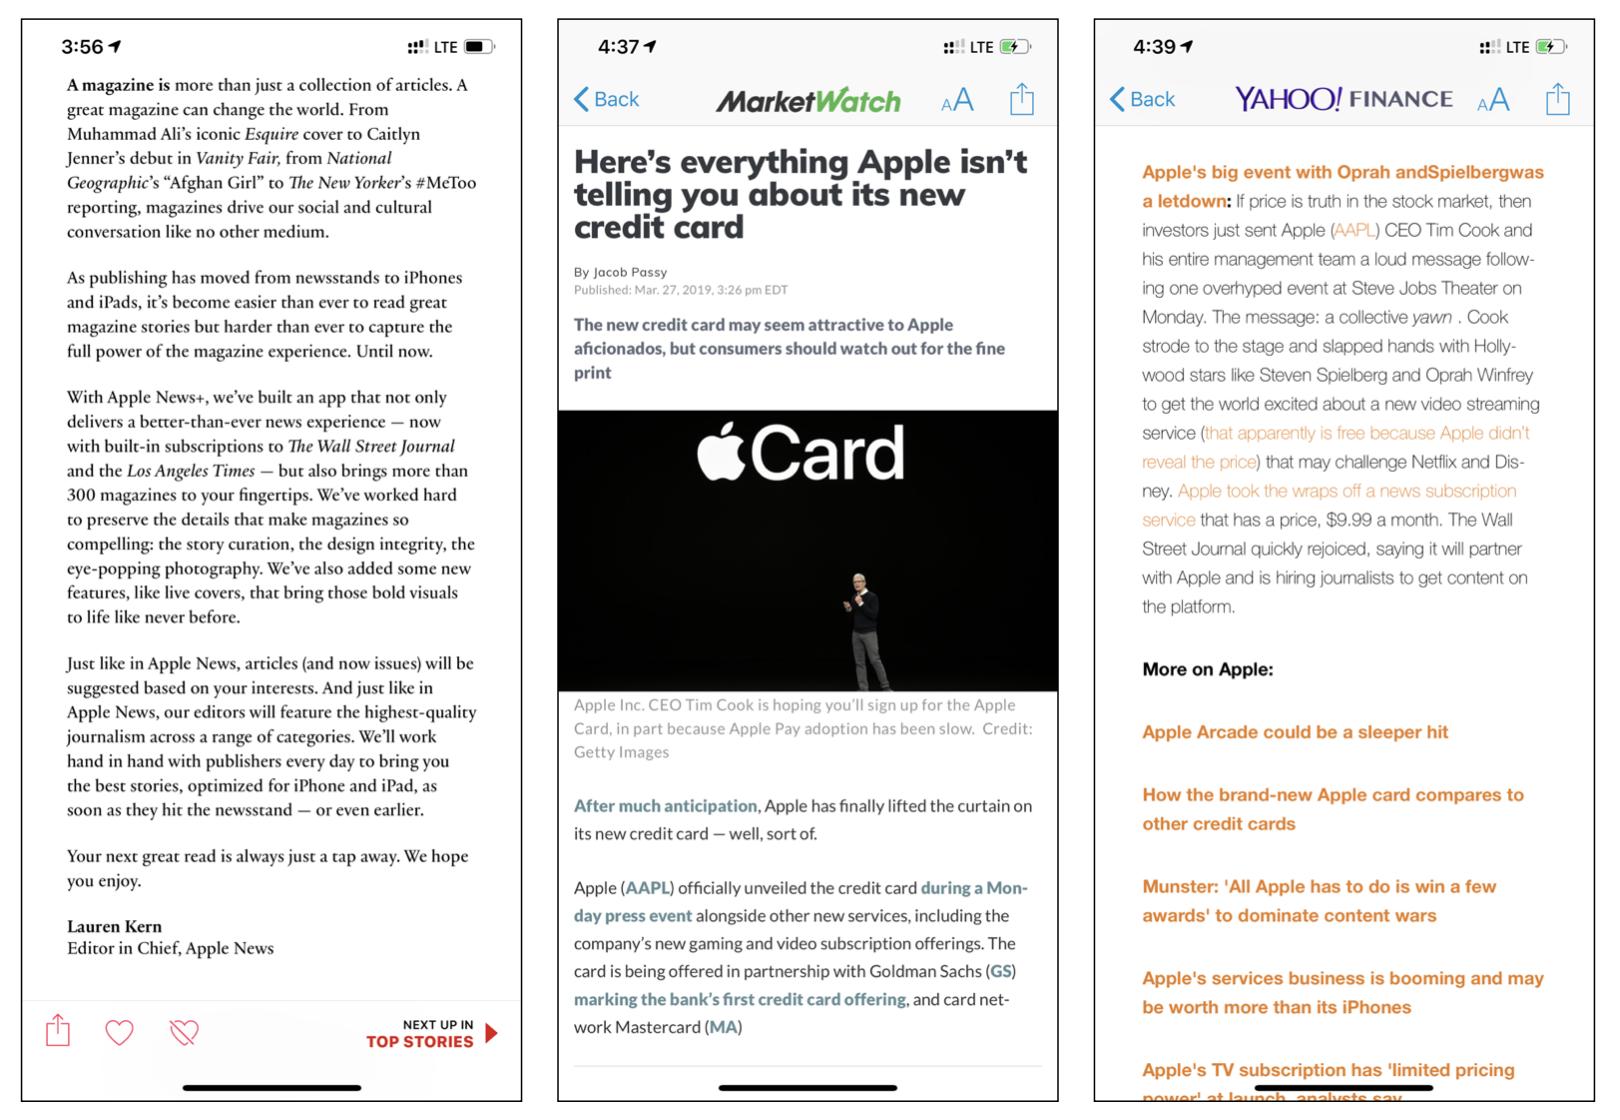 Apple News vision vs reality